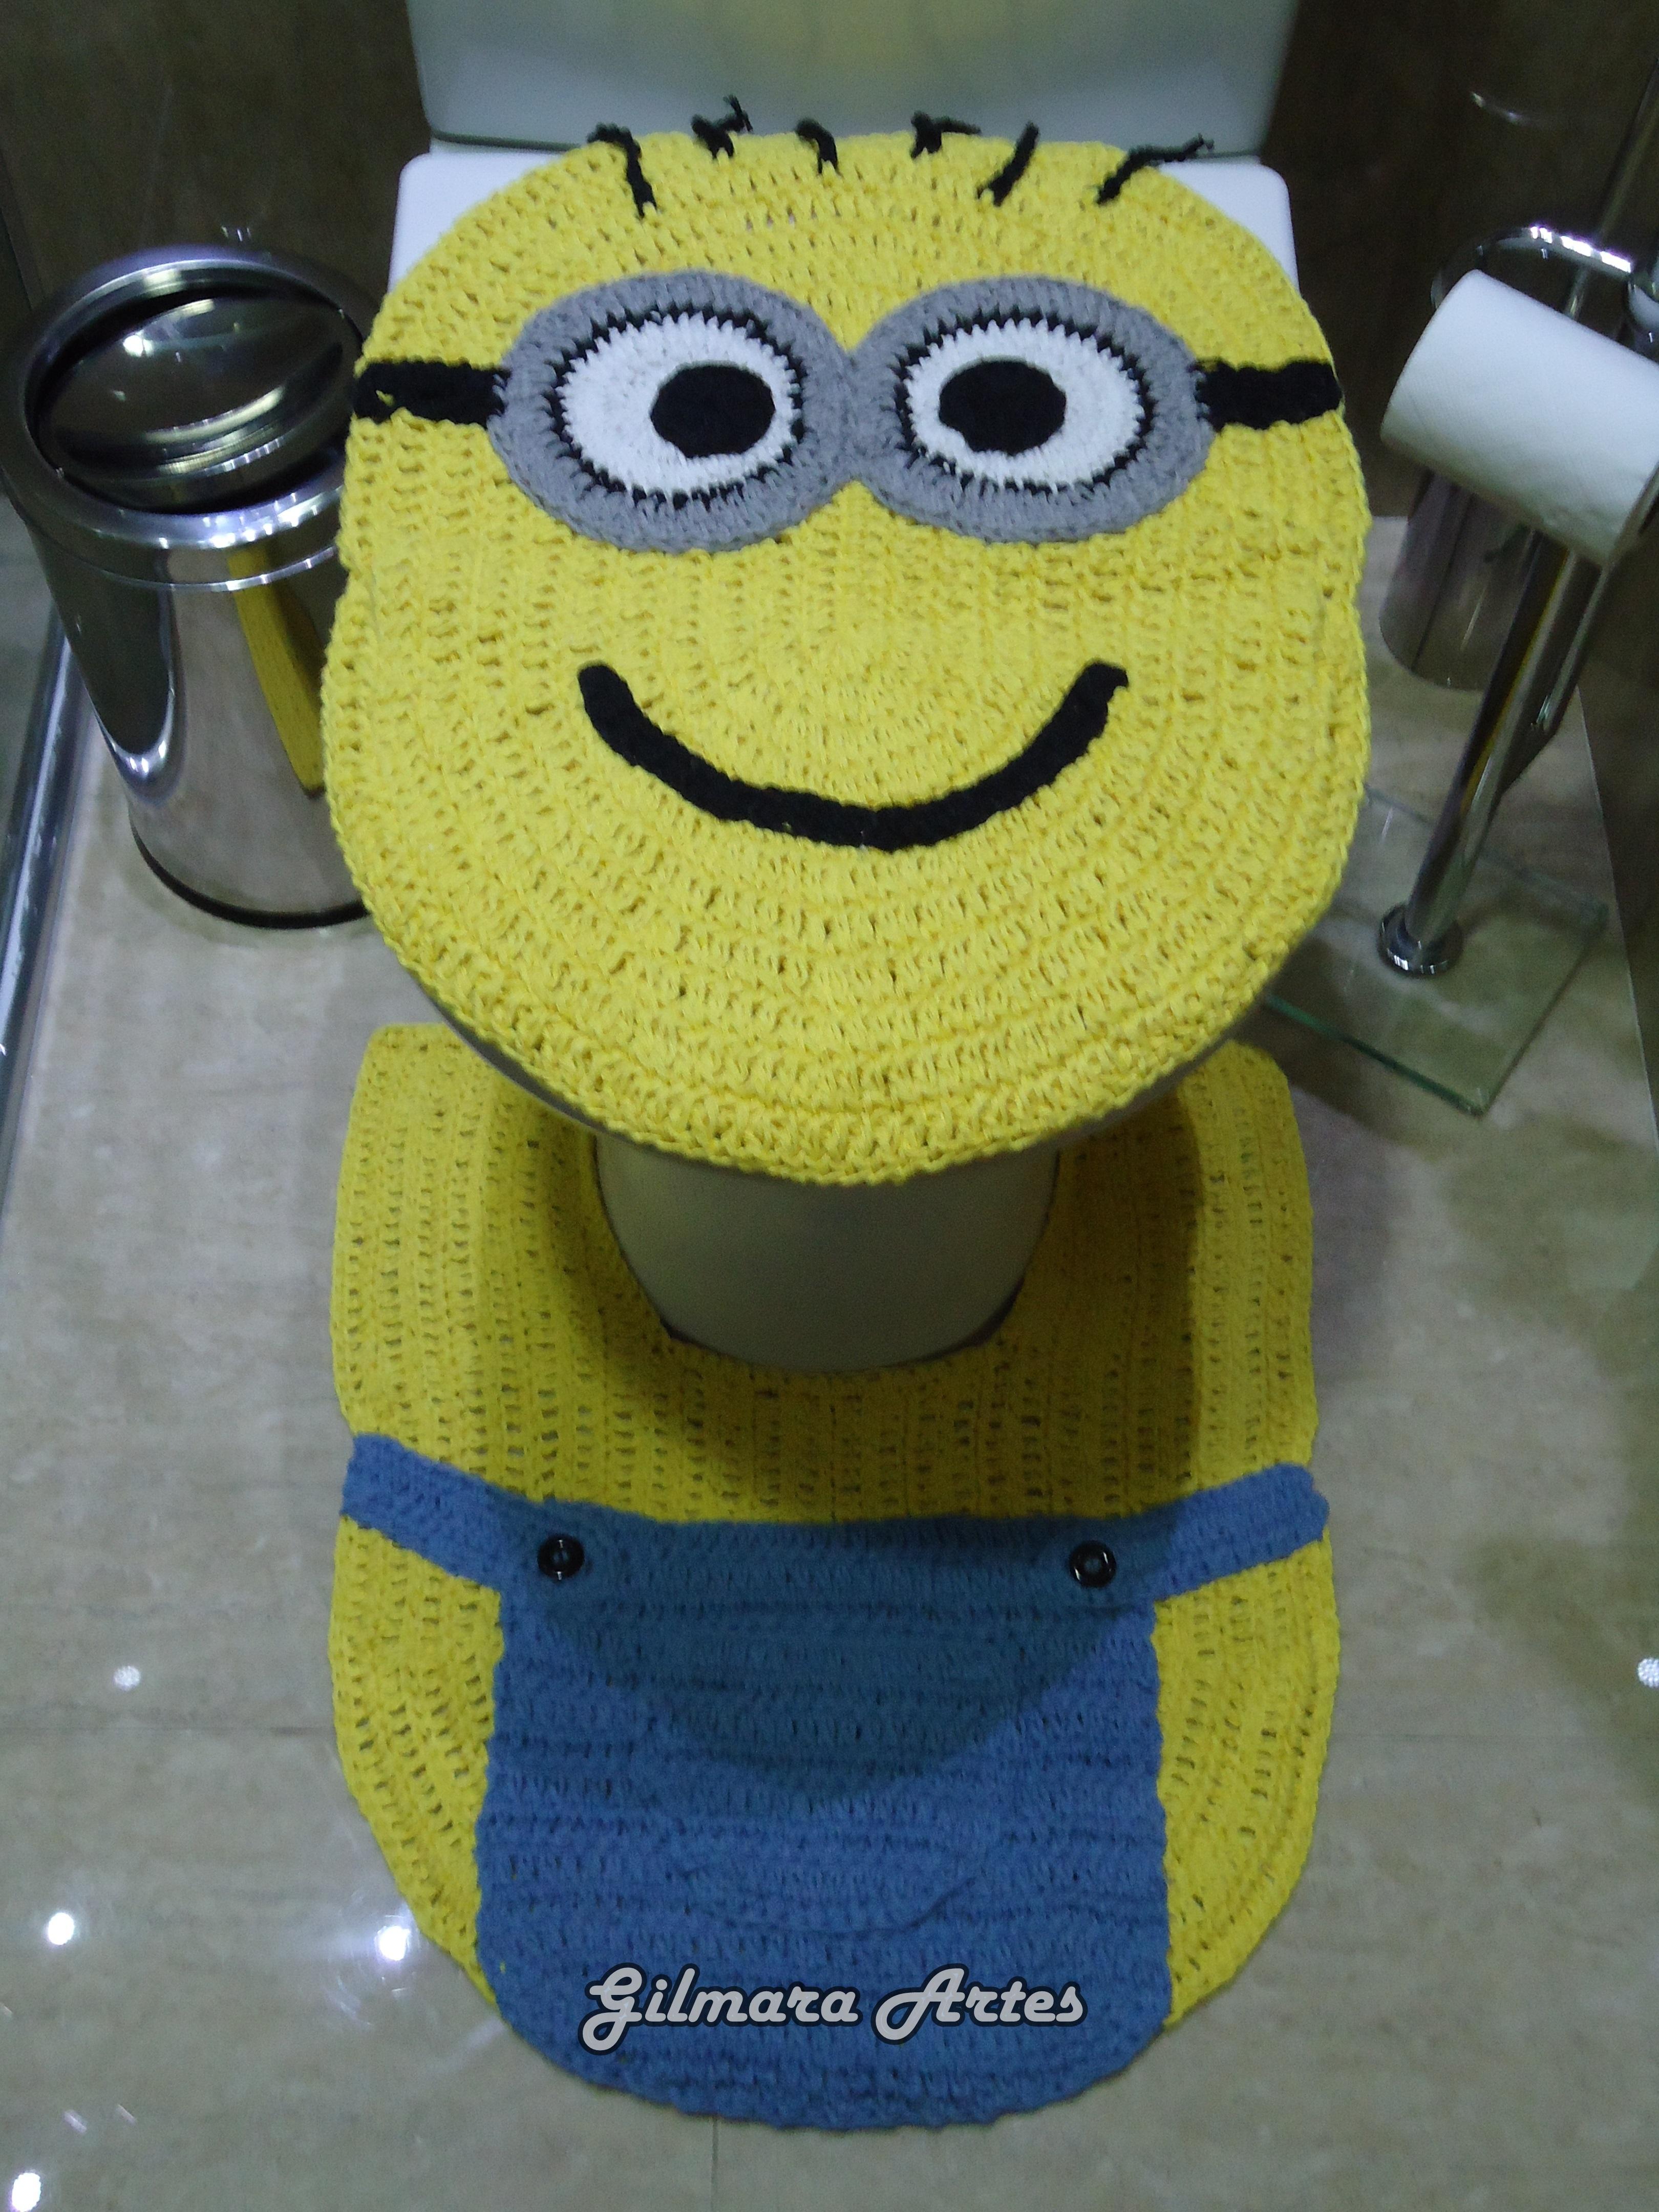 Tapete Minions De Croche : minions-tapete-bnh-074-jg-c-03-pcs-minion minions-tapete-bnh-074-jg-c